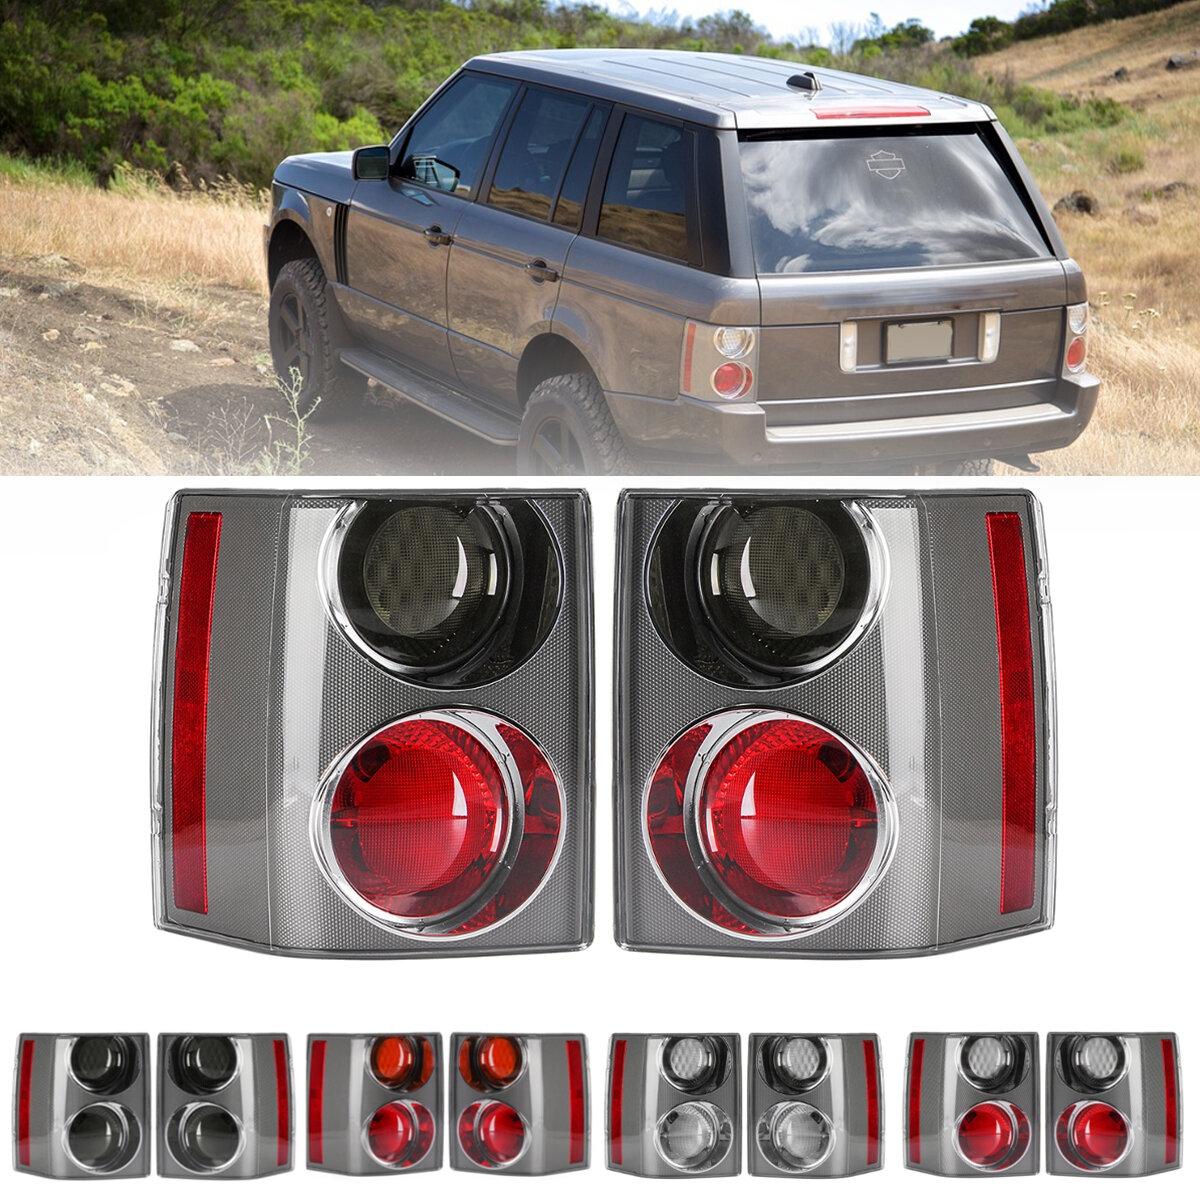 Car Tail Lights >> Car Rear Tail Light Assembly Brake Lamp Pair For Range Rover Vogue L322 2002 2009